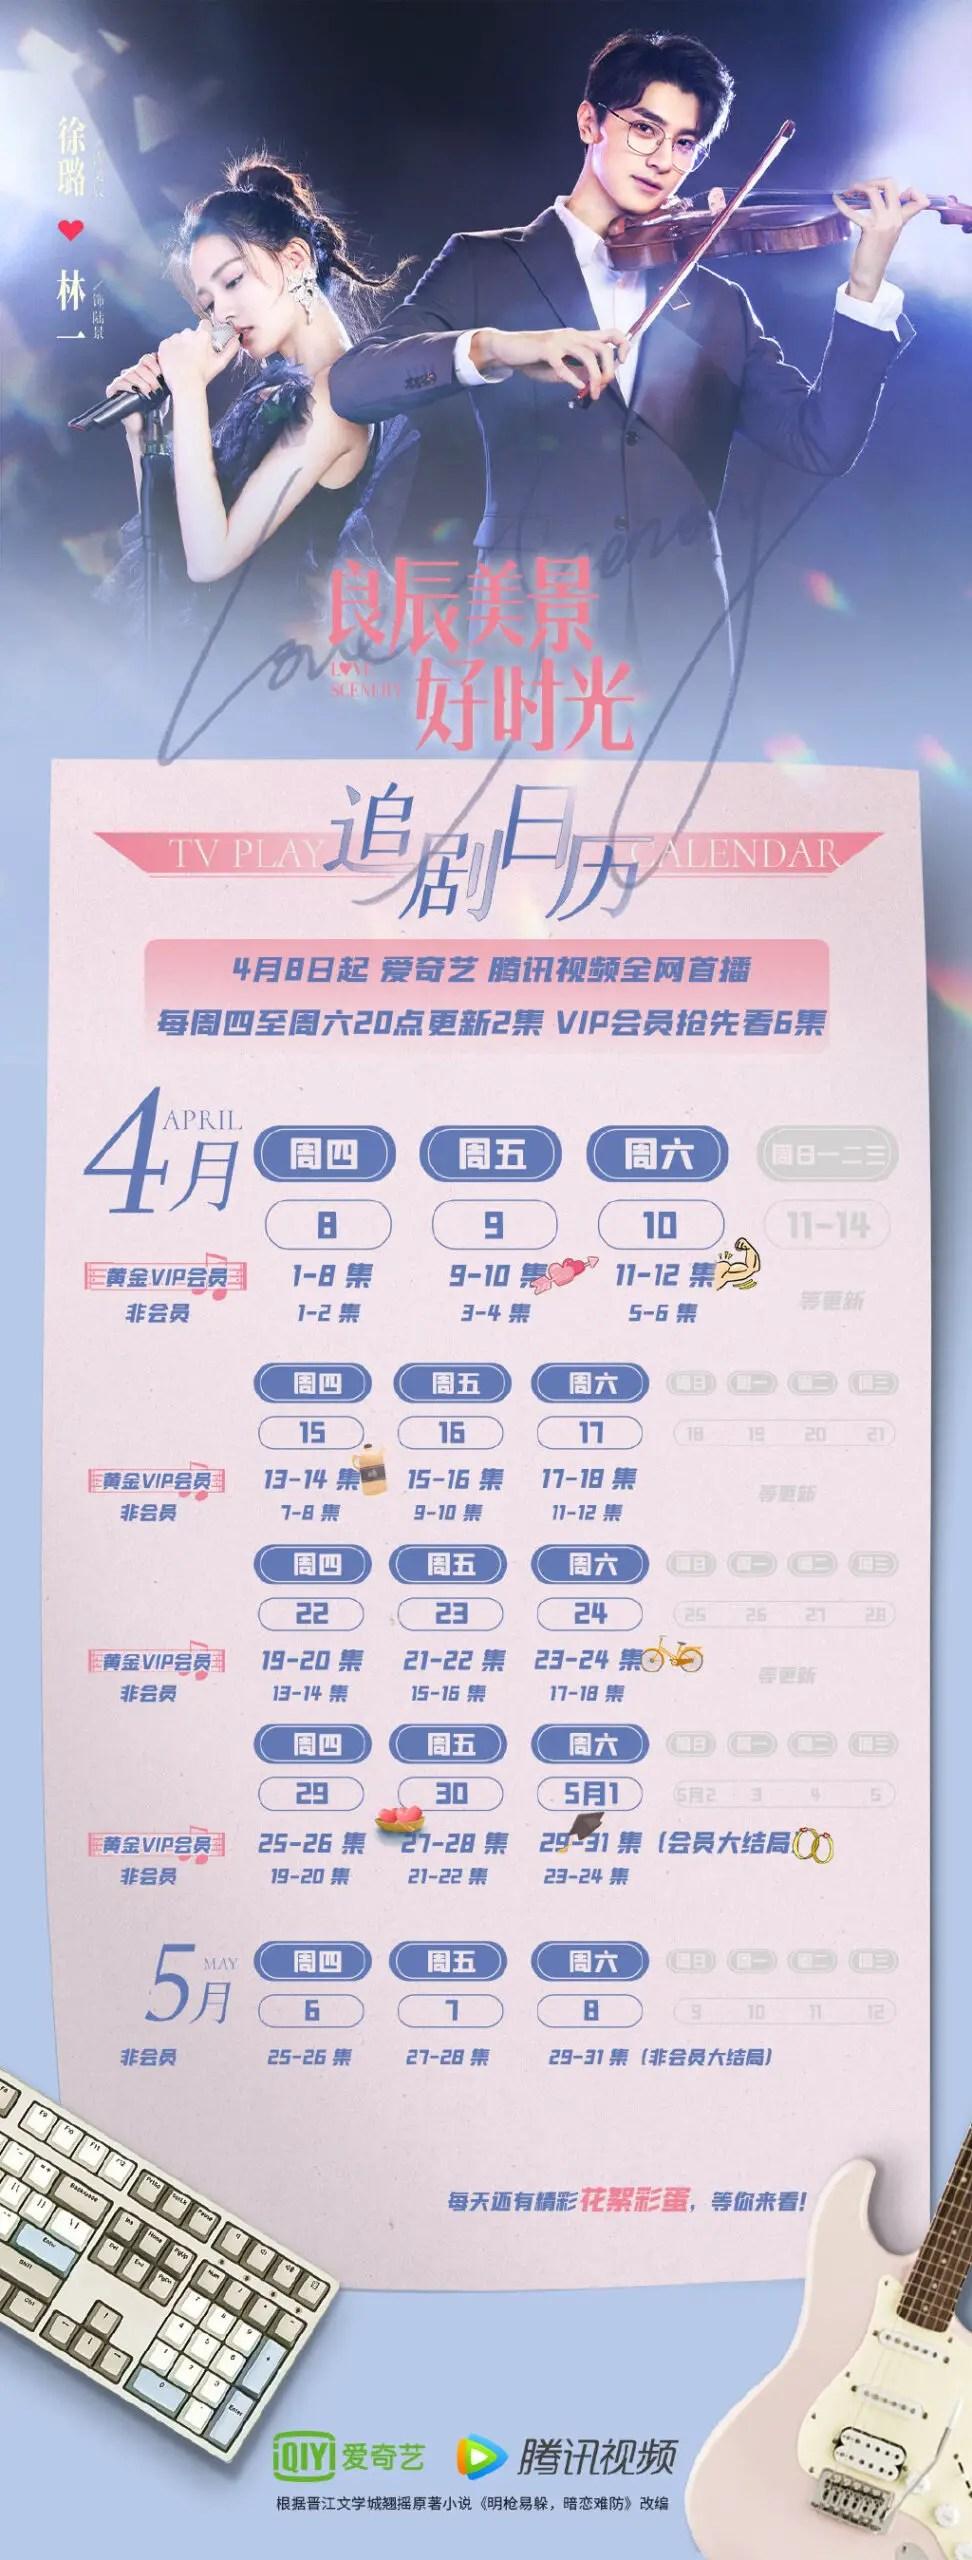 Love Scenery Chinese Drama Airing Calendar